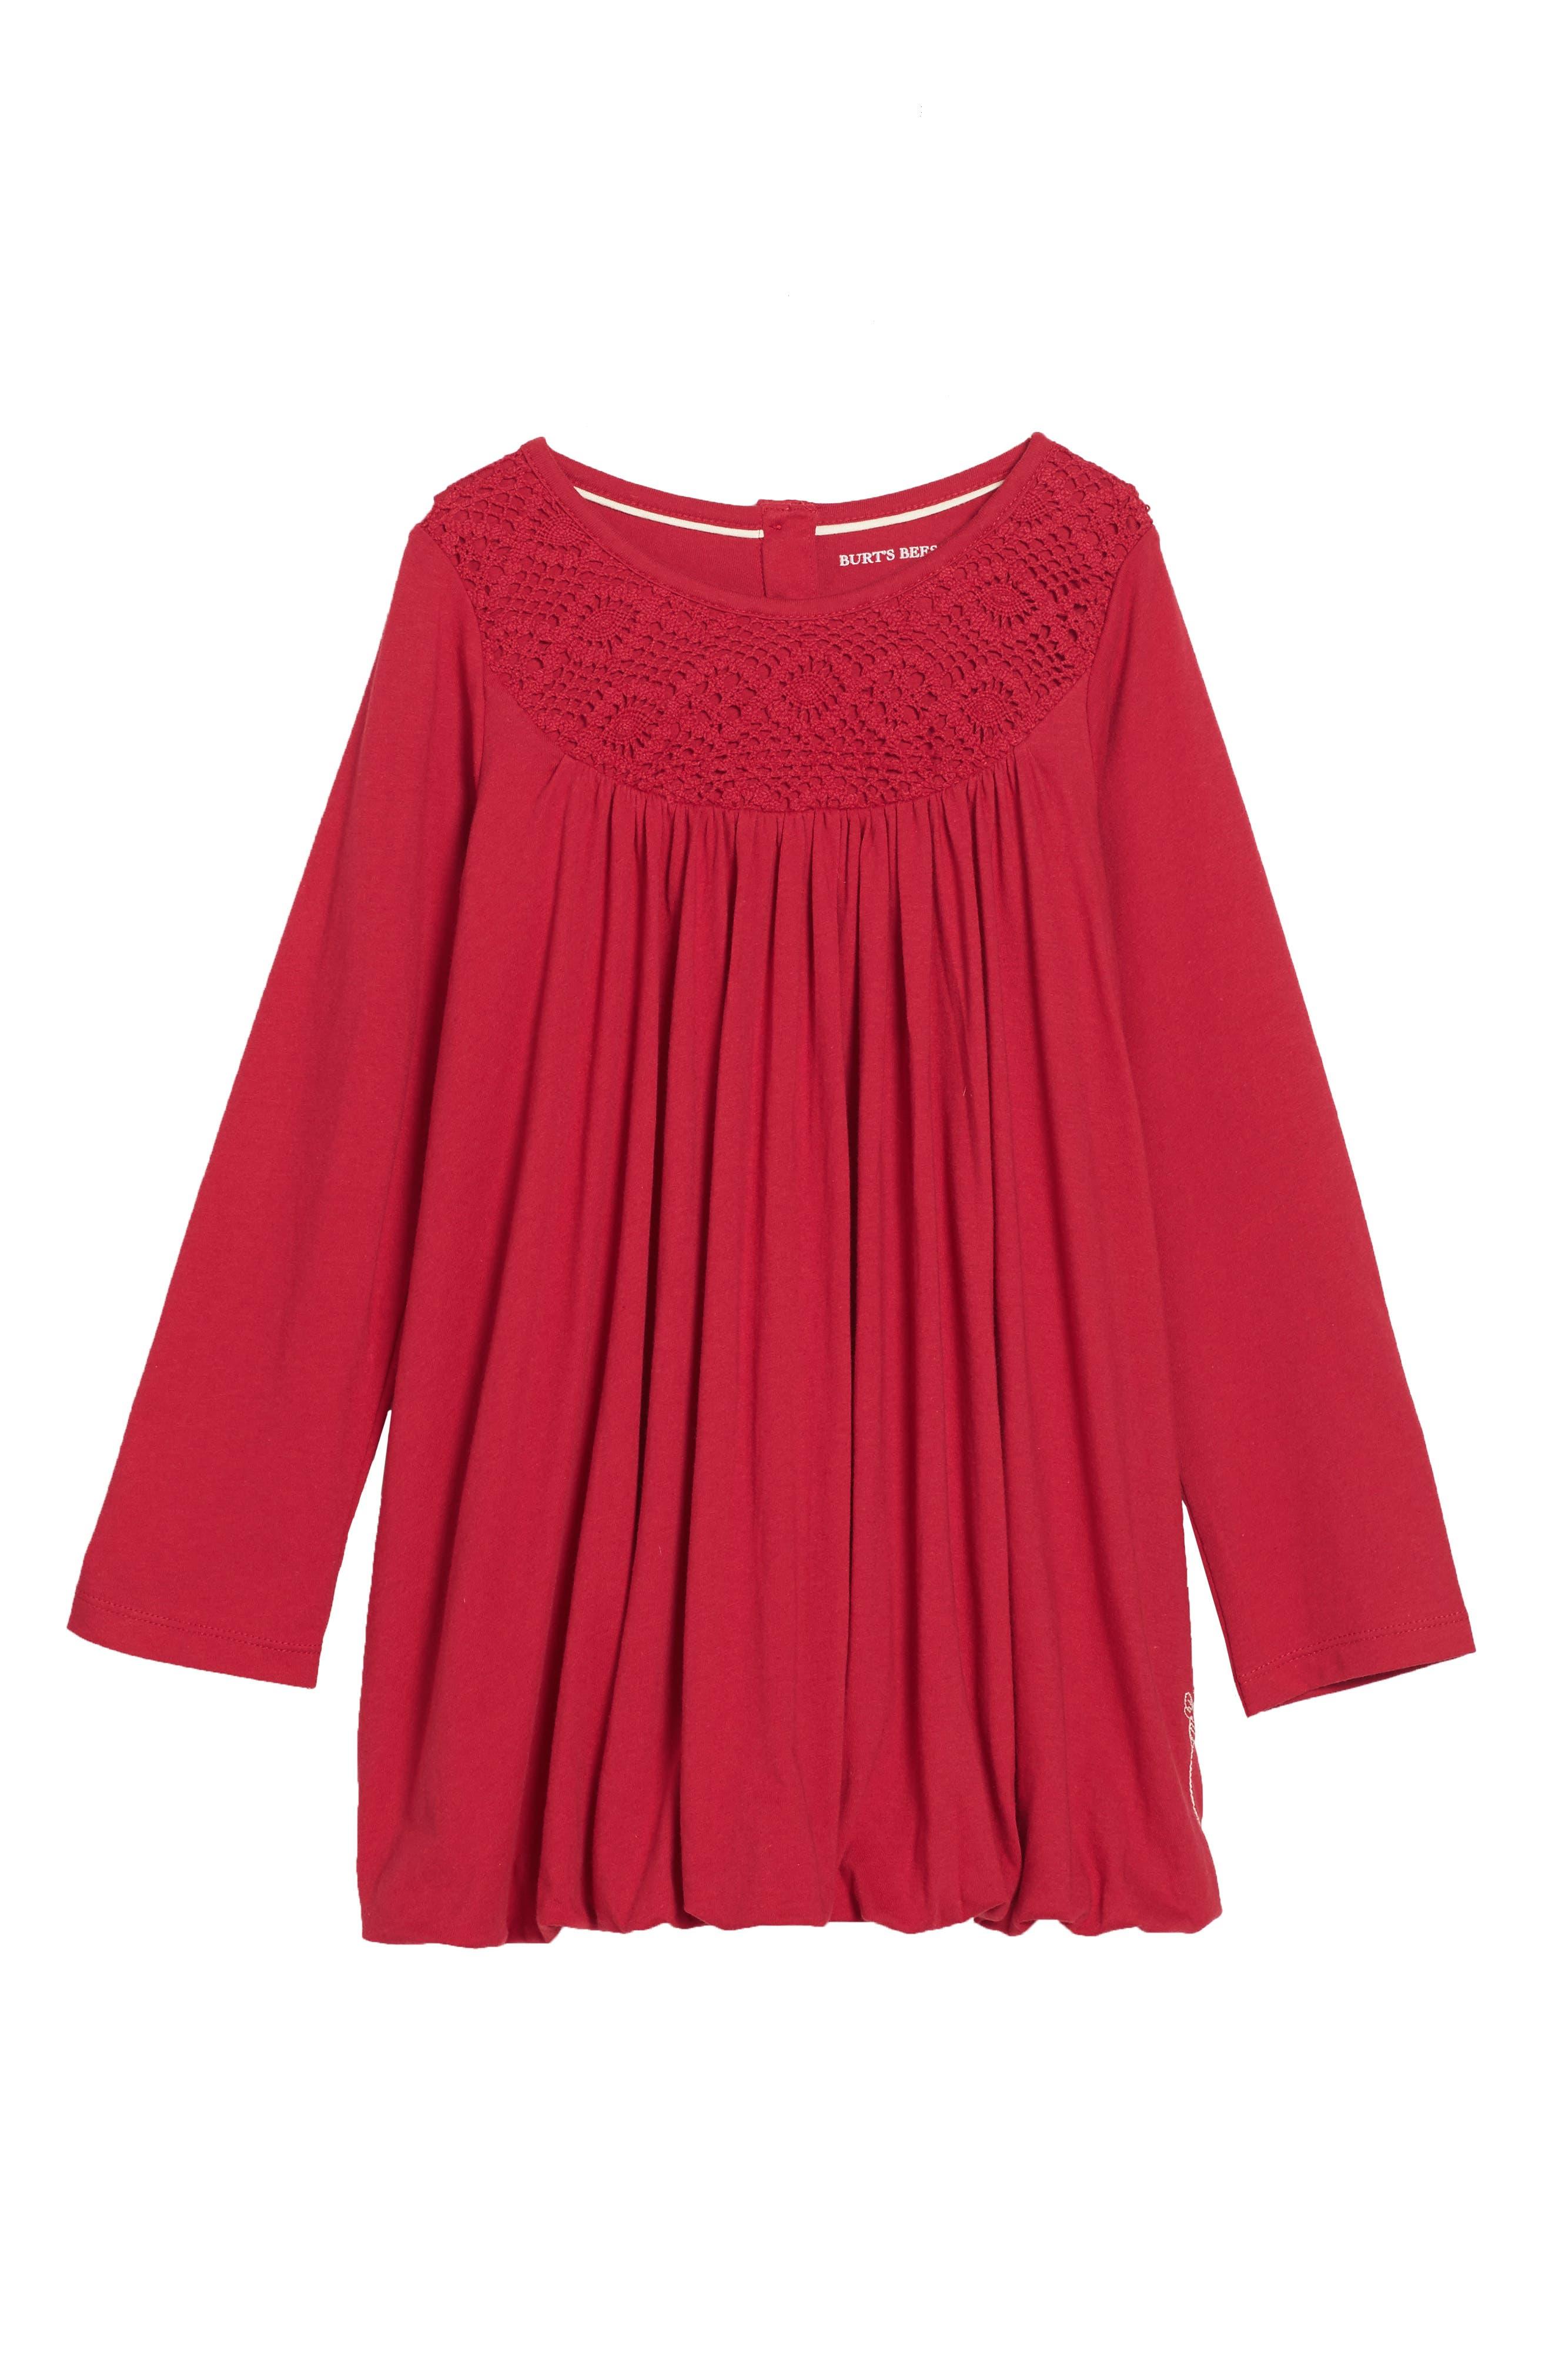 Organic Cotton Bubble Dress,                             Main thumbnail 1, color,                             620